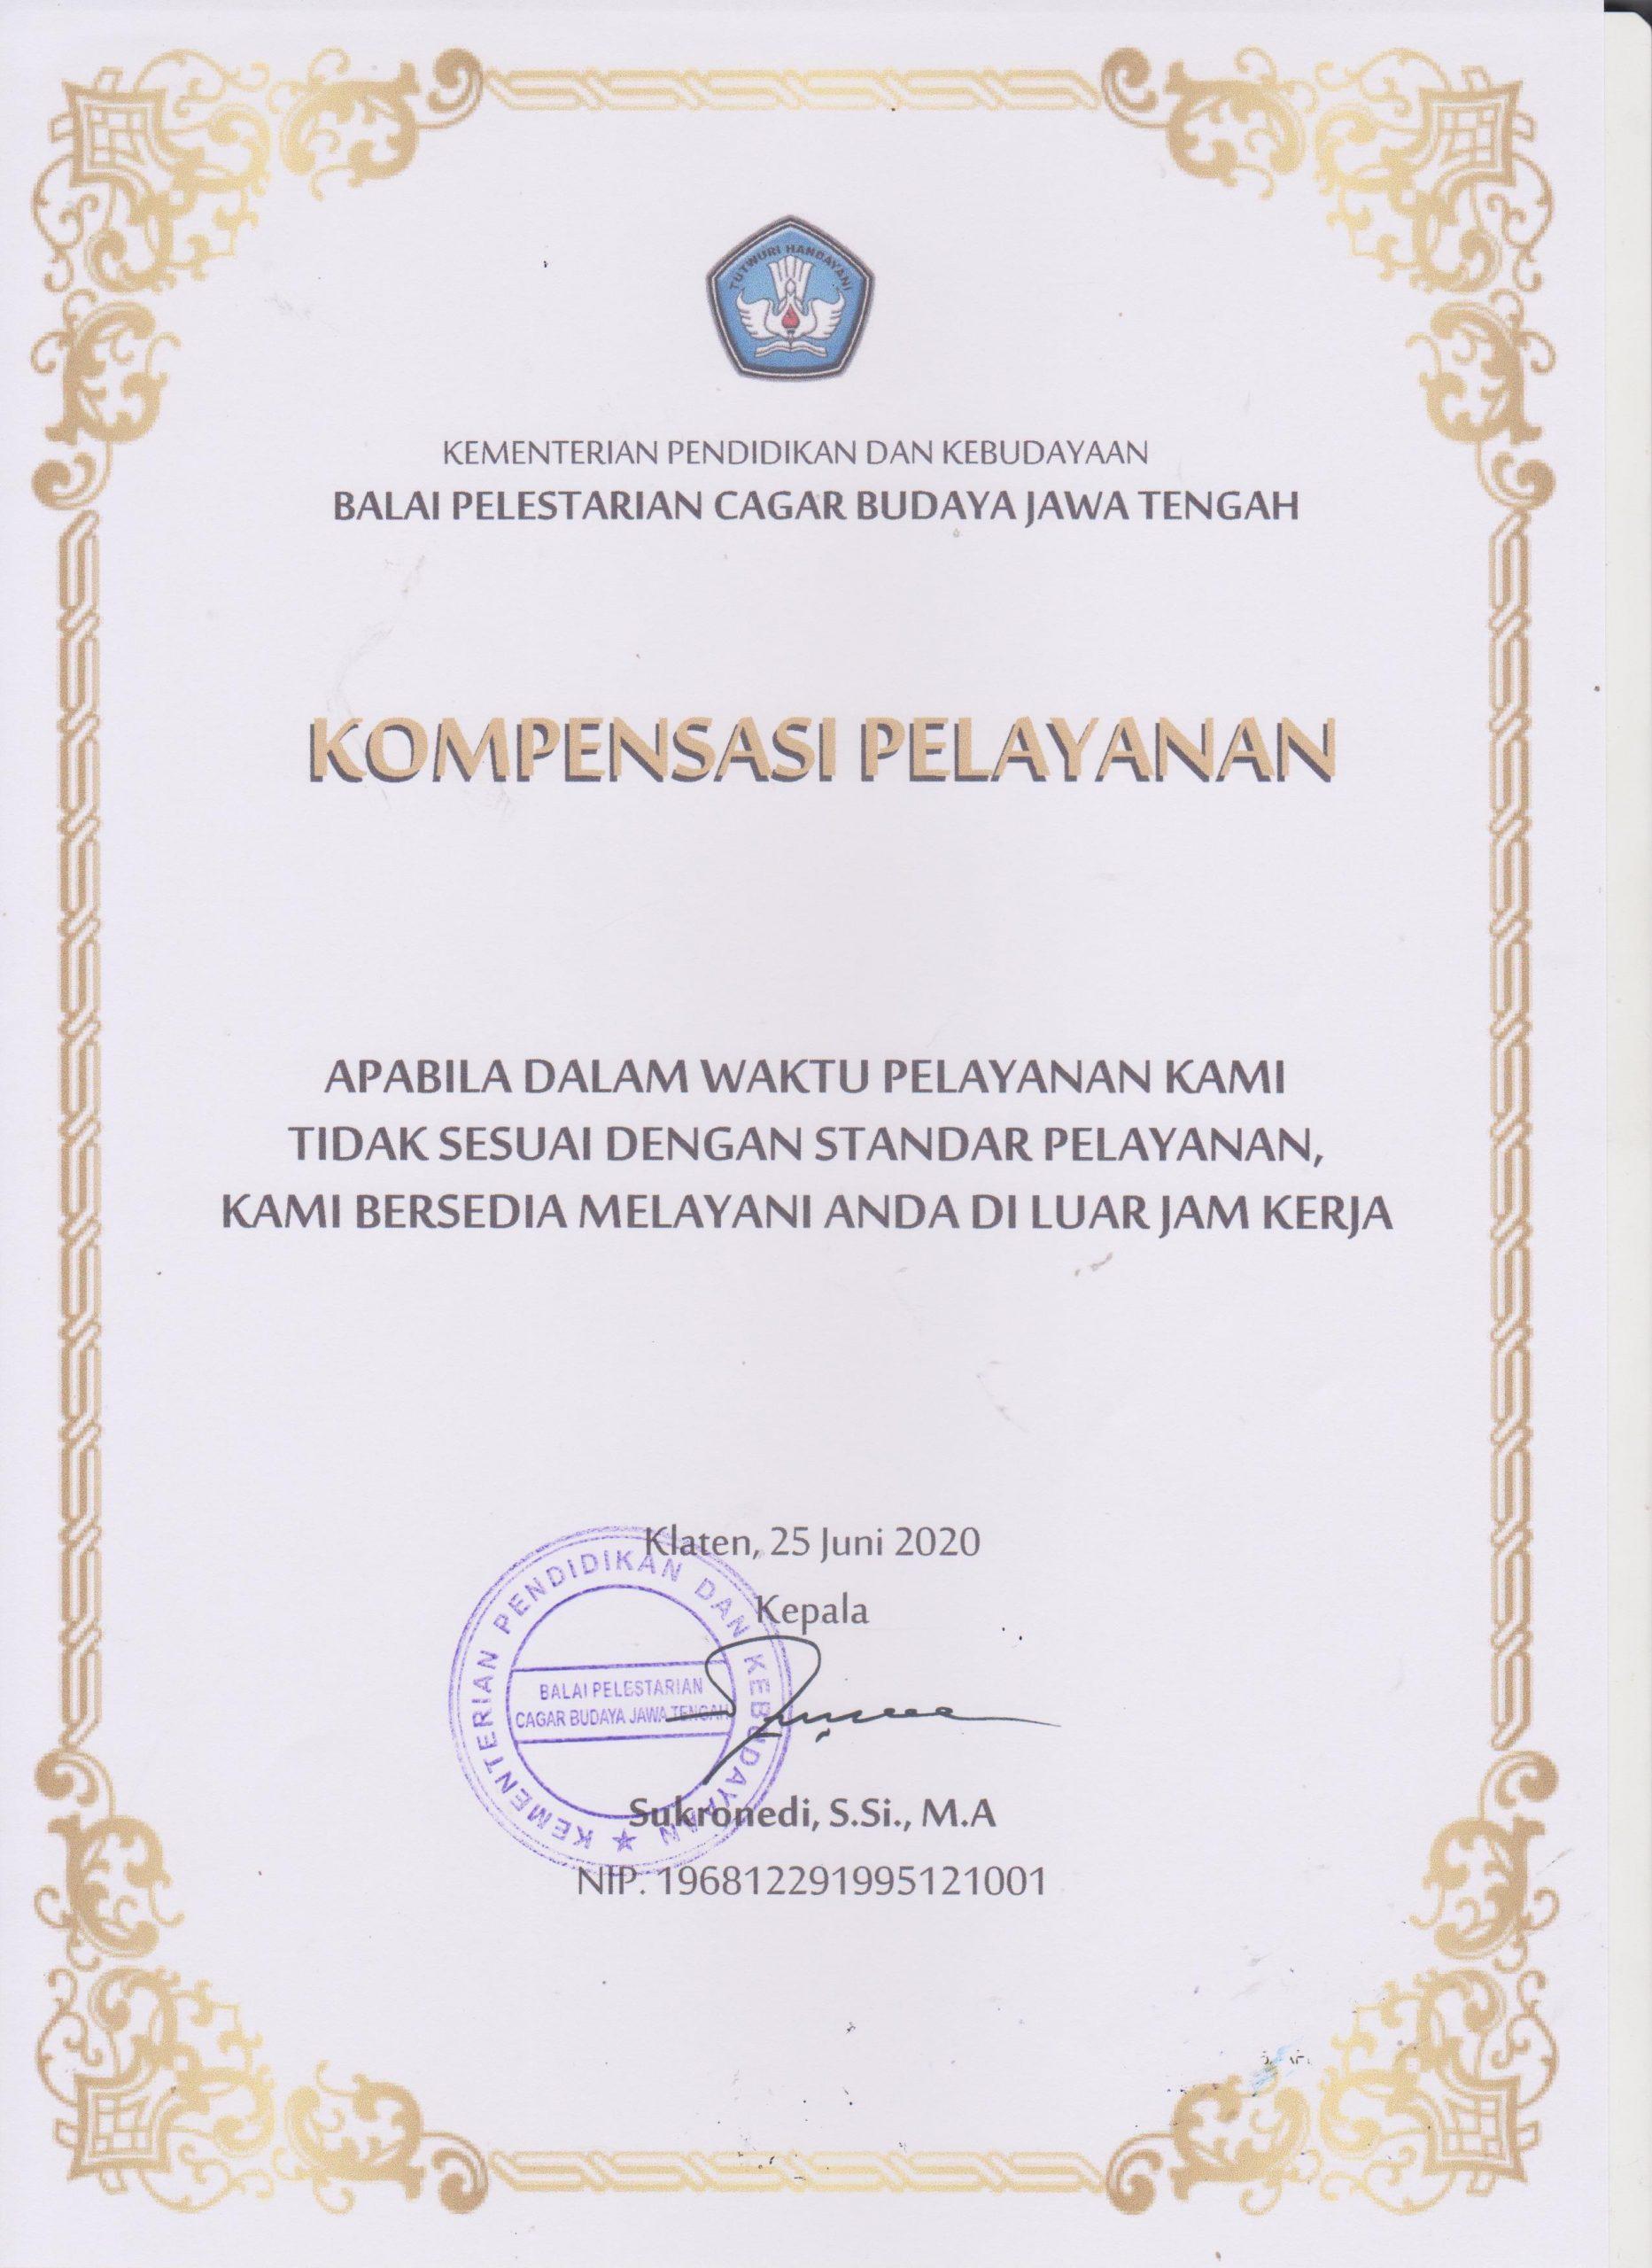 You are currently viewing Kompensasi Pelayanan Balai Pelestarian Cagar Budaya Jawa Tengah